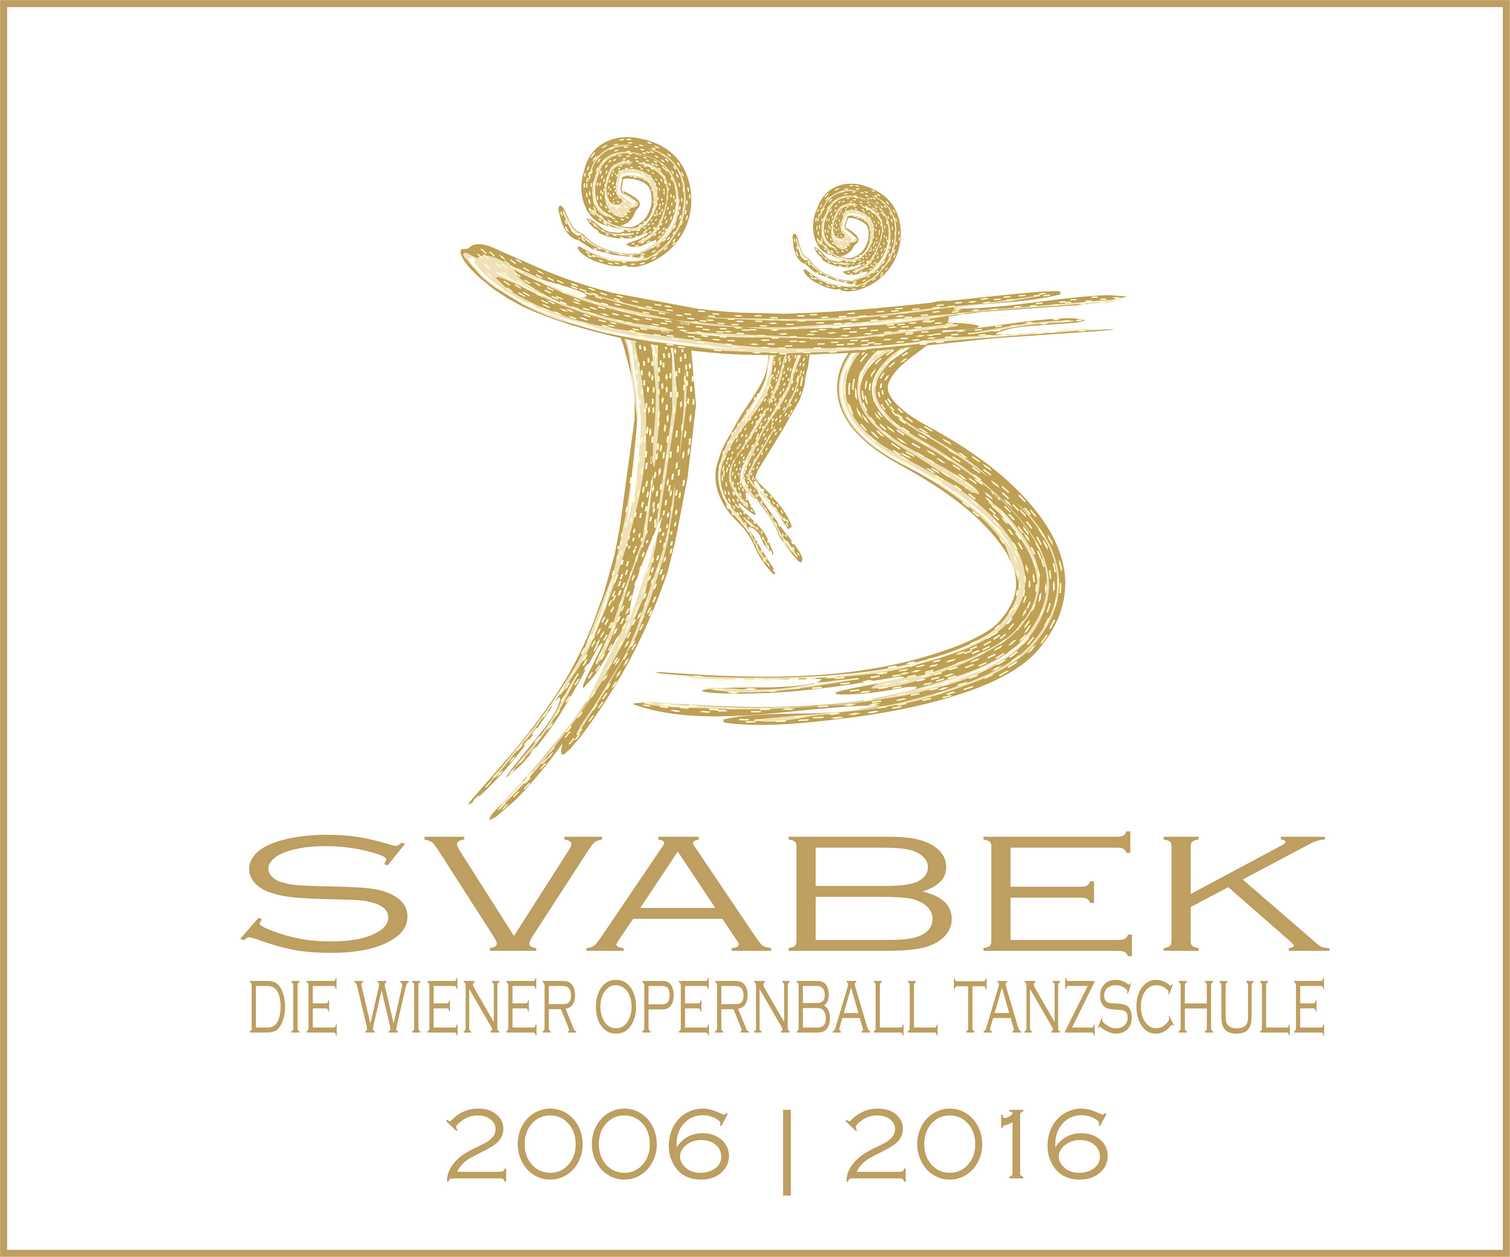 Tanzschule Svabek